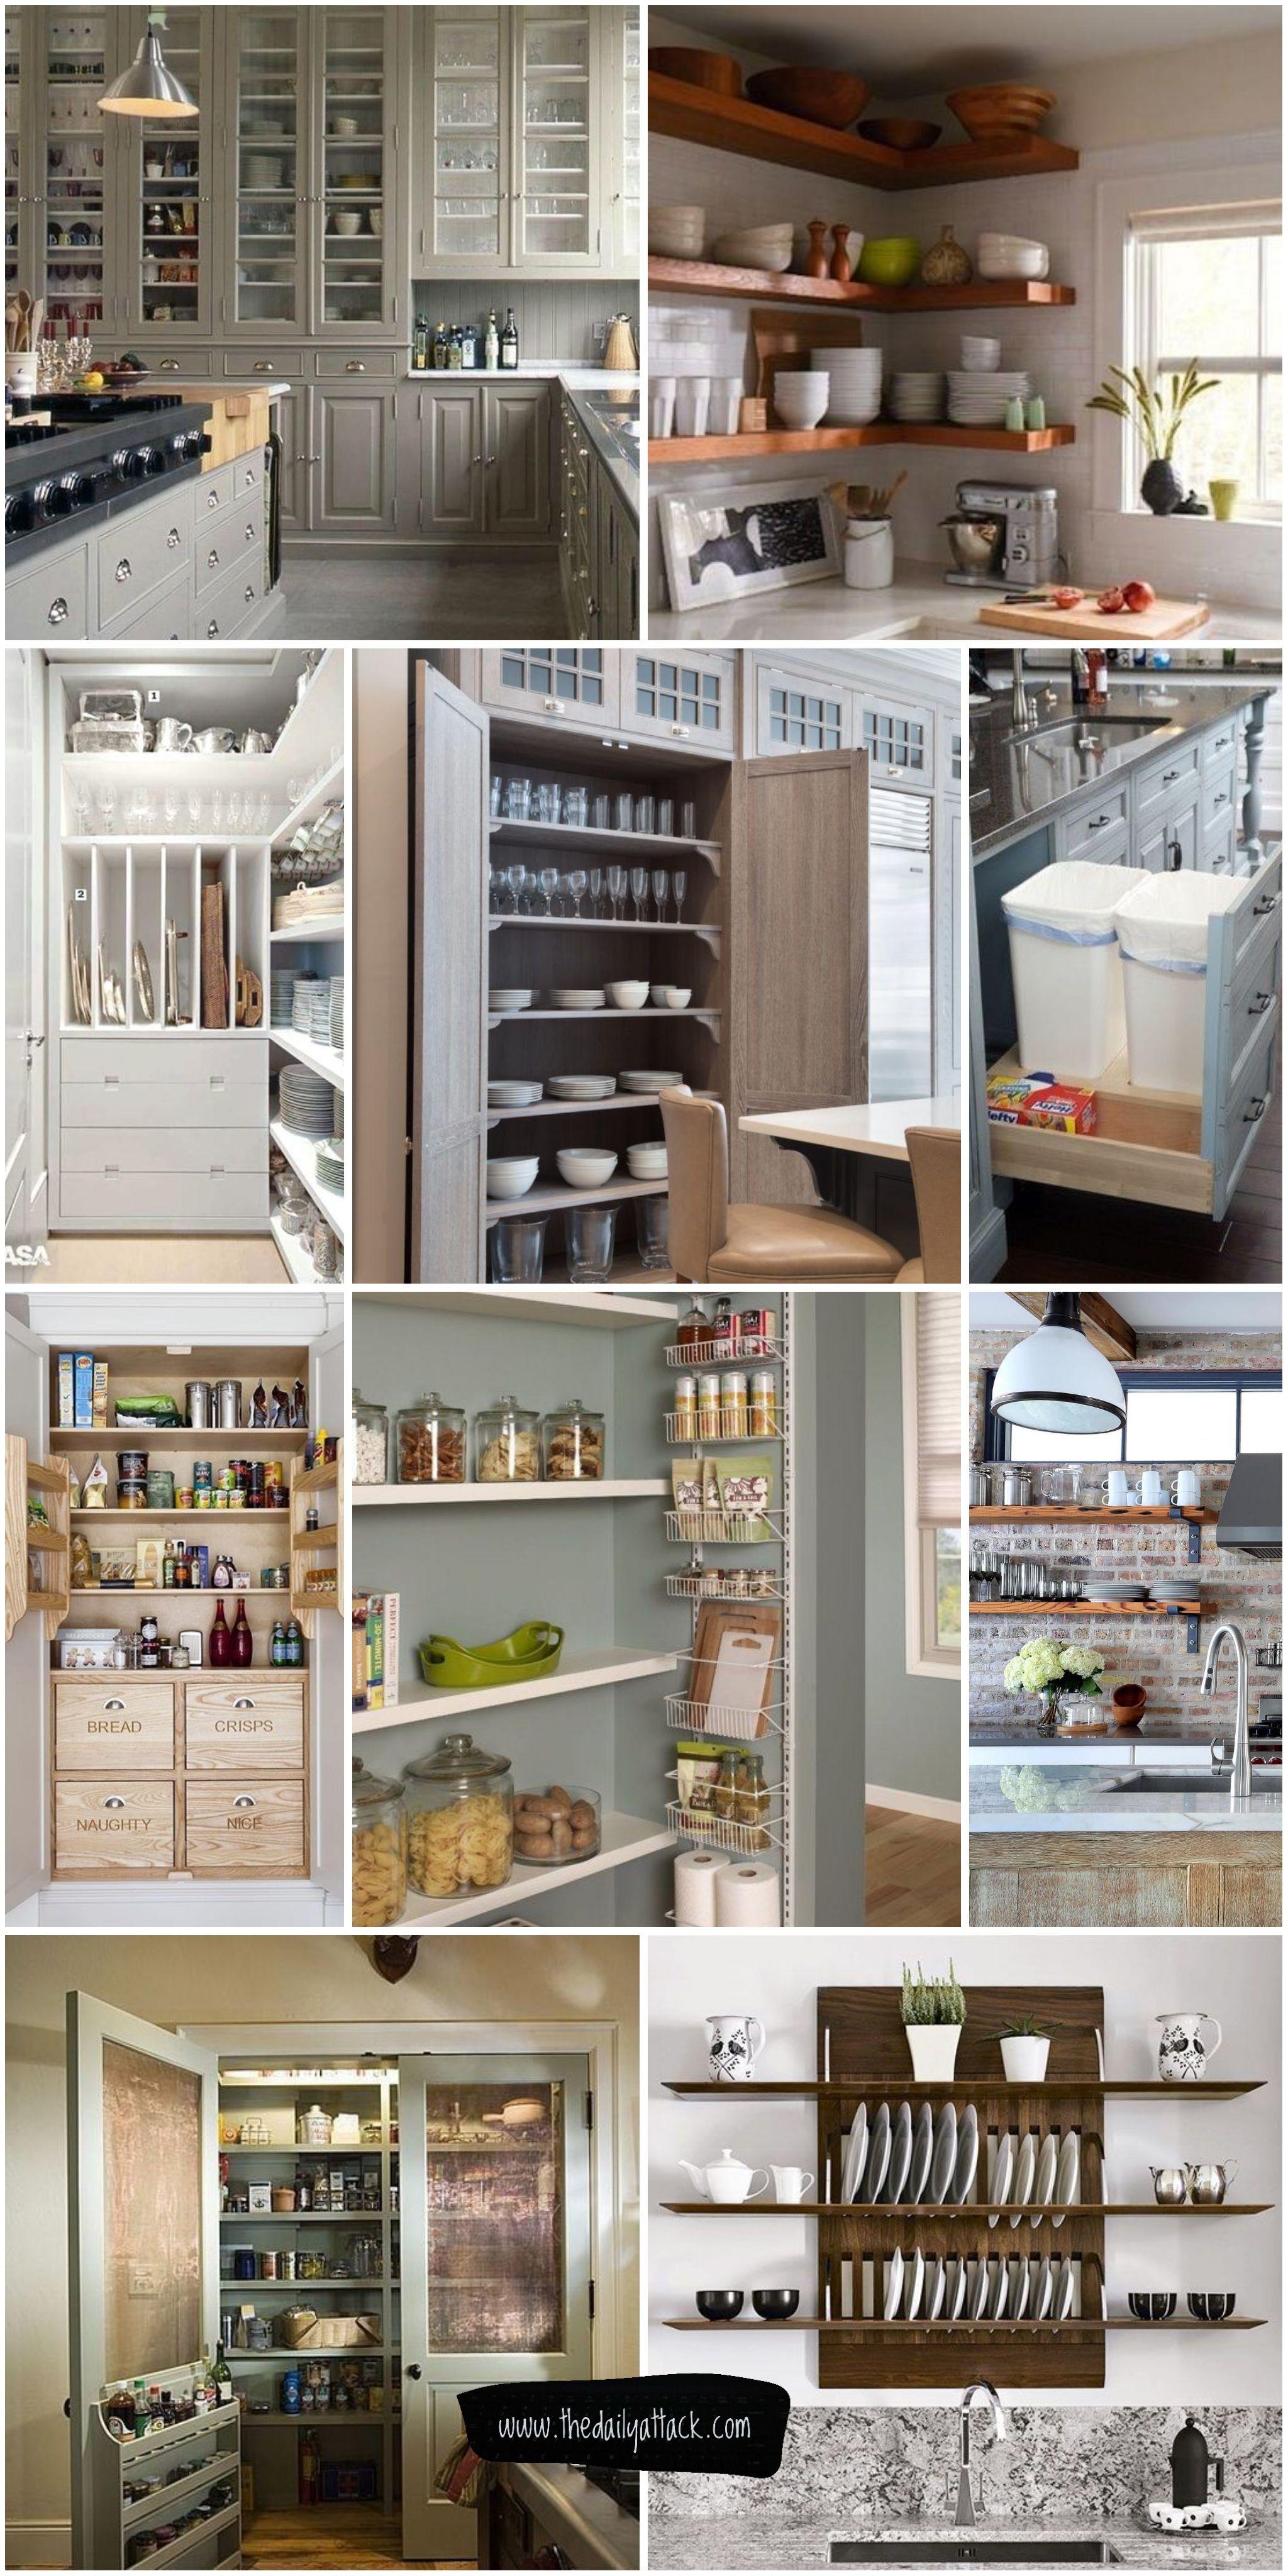 61 Unique Kitchen Storage Ideas Easy Storage Solutions For Your Kitchen Kitchen Remodel Small Apartment Pantry Trendy Kitchen